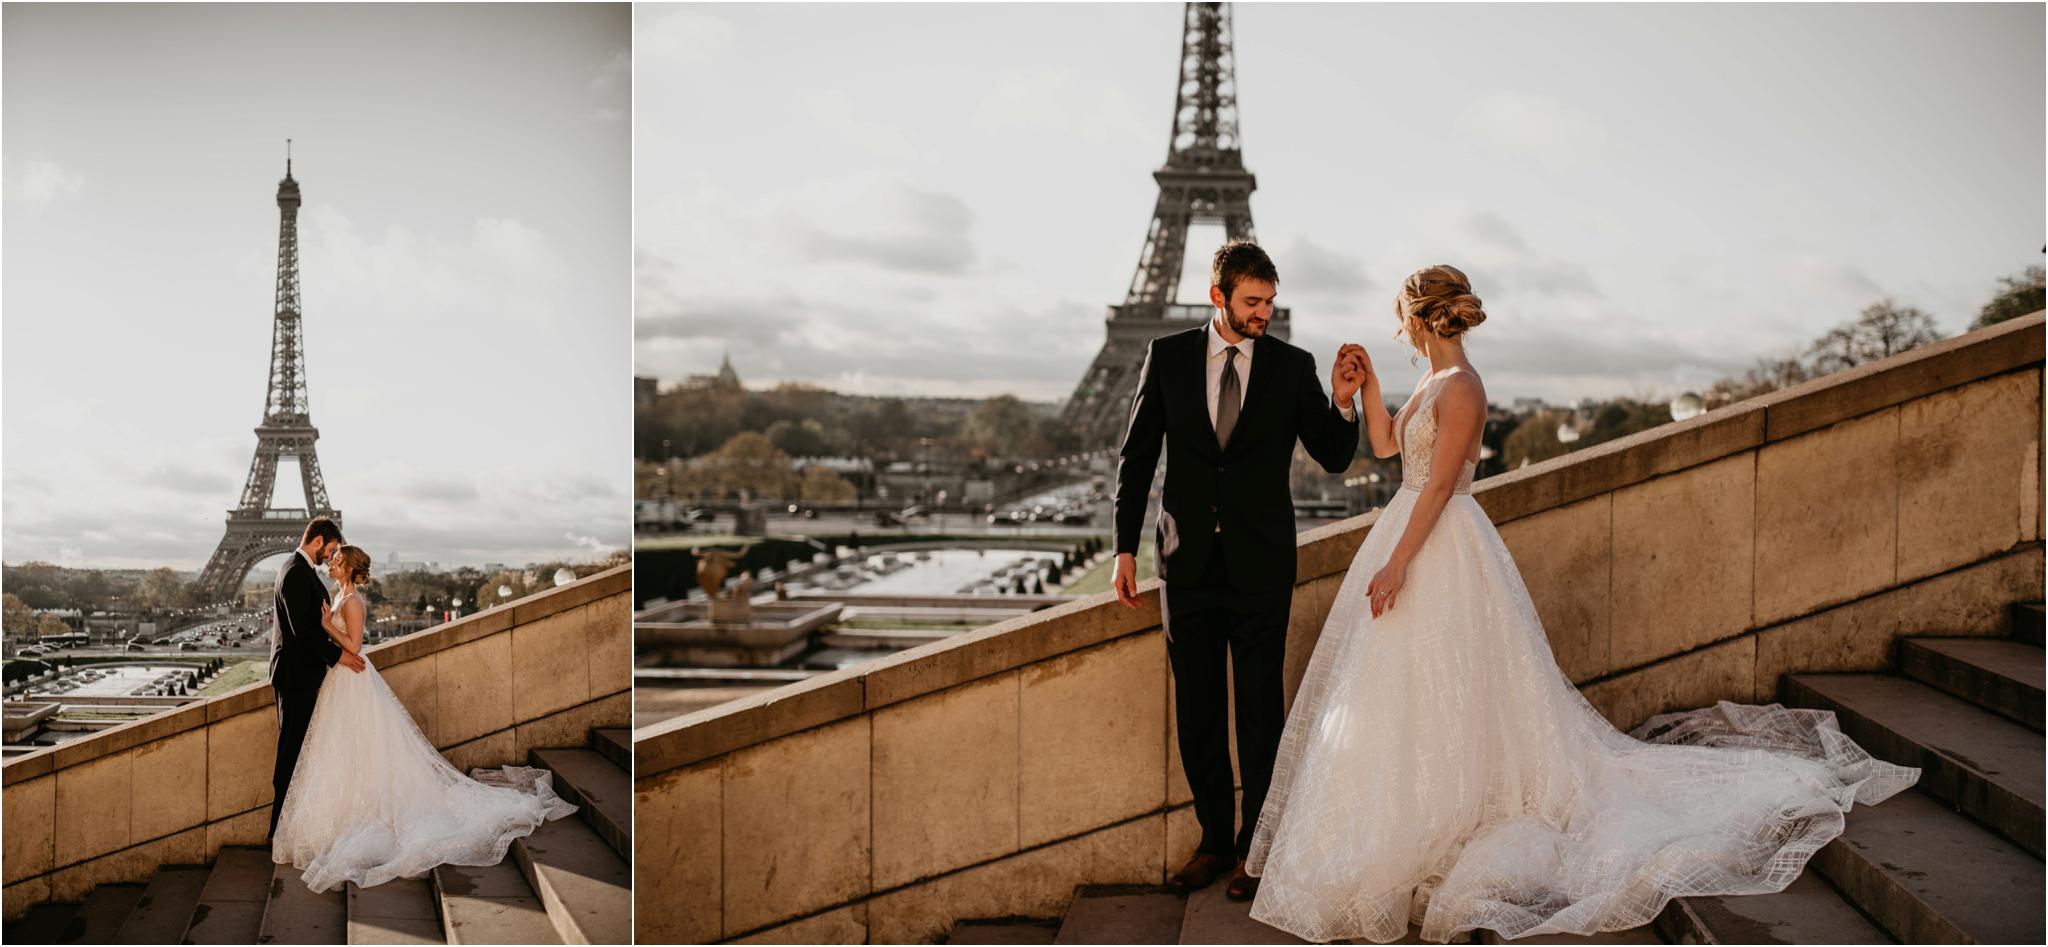 miranda-and-jared-paris-elopement-destination-wedding-photographer-055.jpg